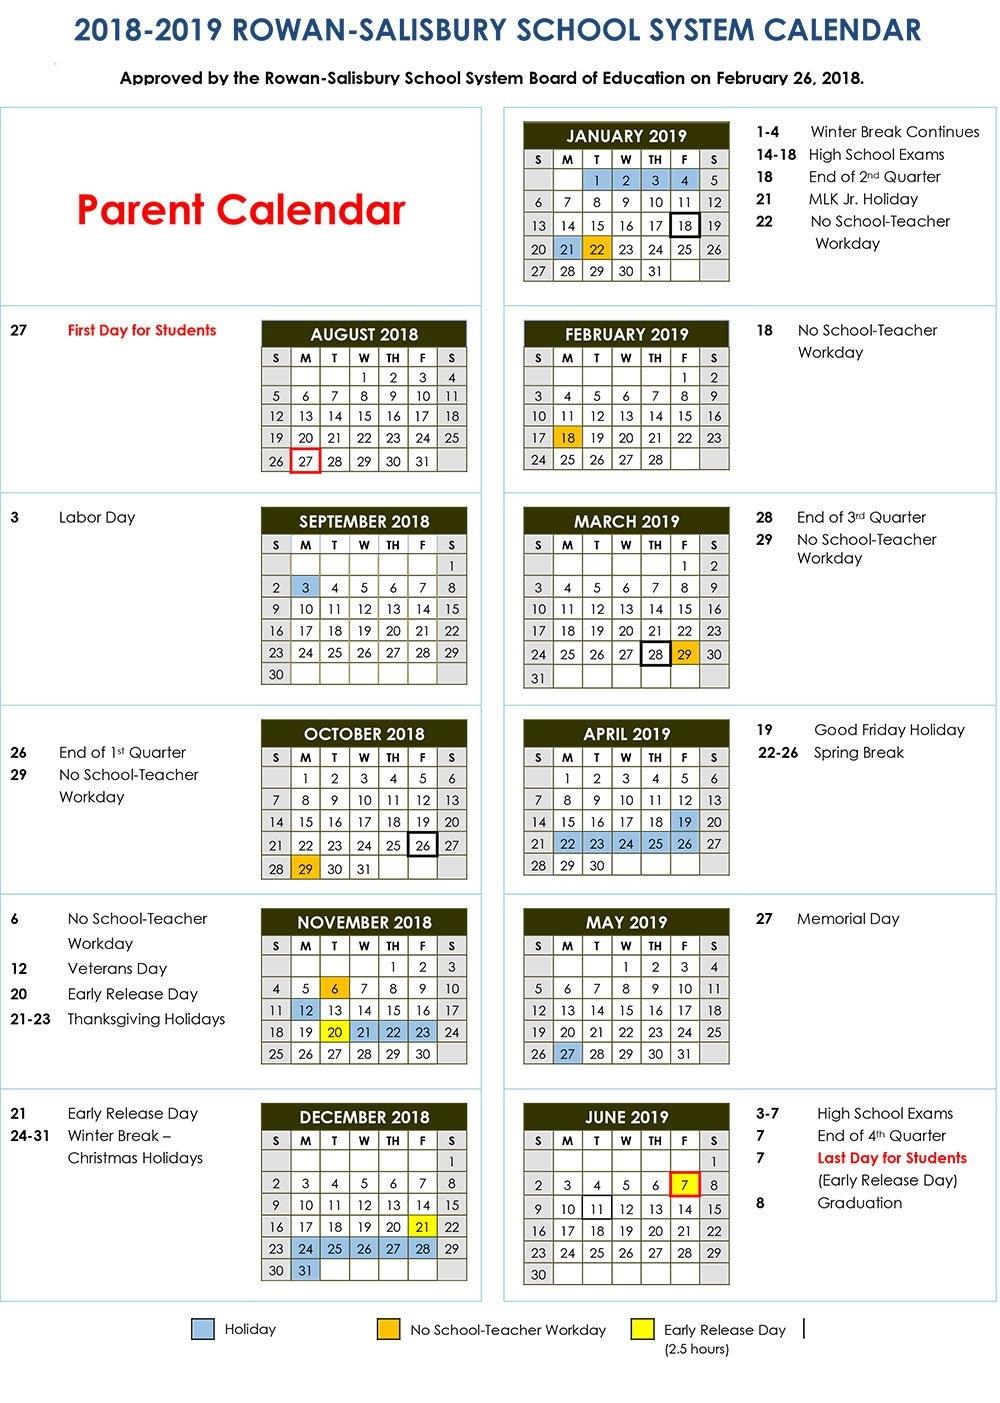 2018-2019 Calendars | District News K State Calendar Spring 2019